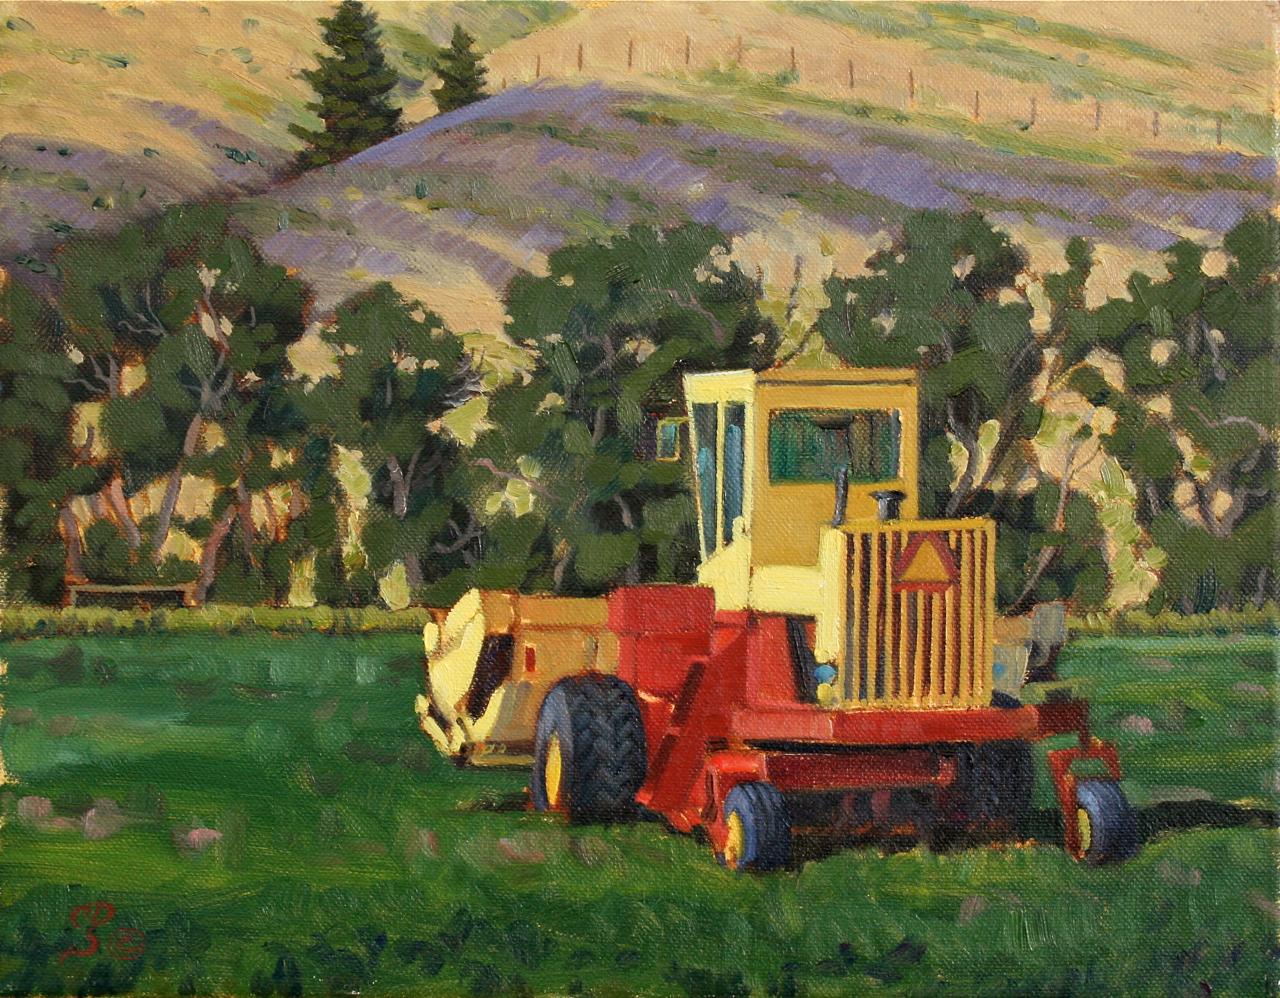 New Holland Tractor  (257.5)1.jpg